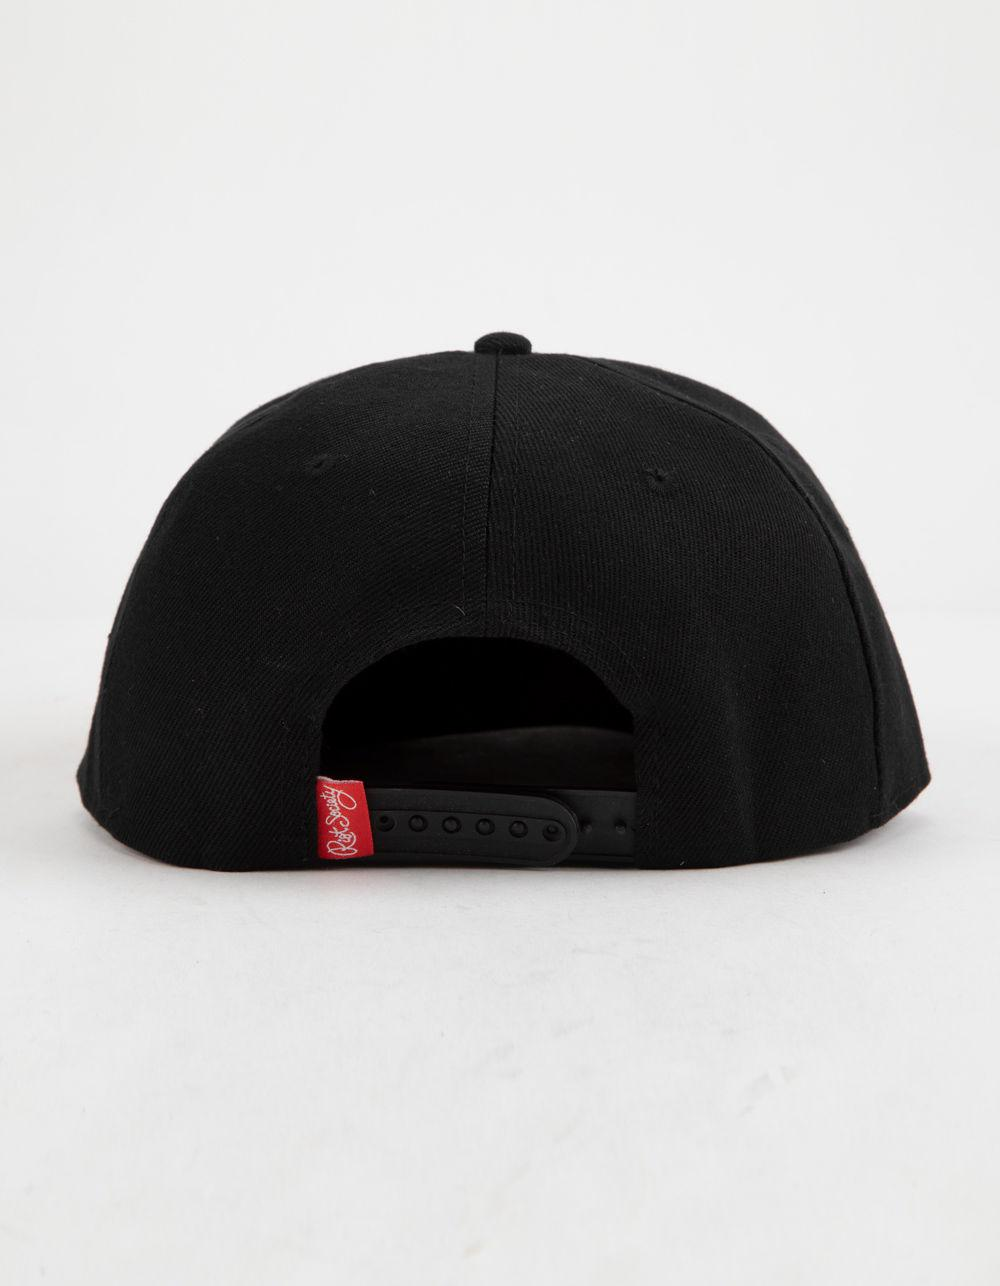 644b466a Riot Society Tiger Rose Black Mens Snapback Hat in Black for Men - Lyst